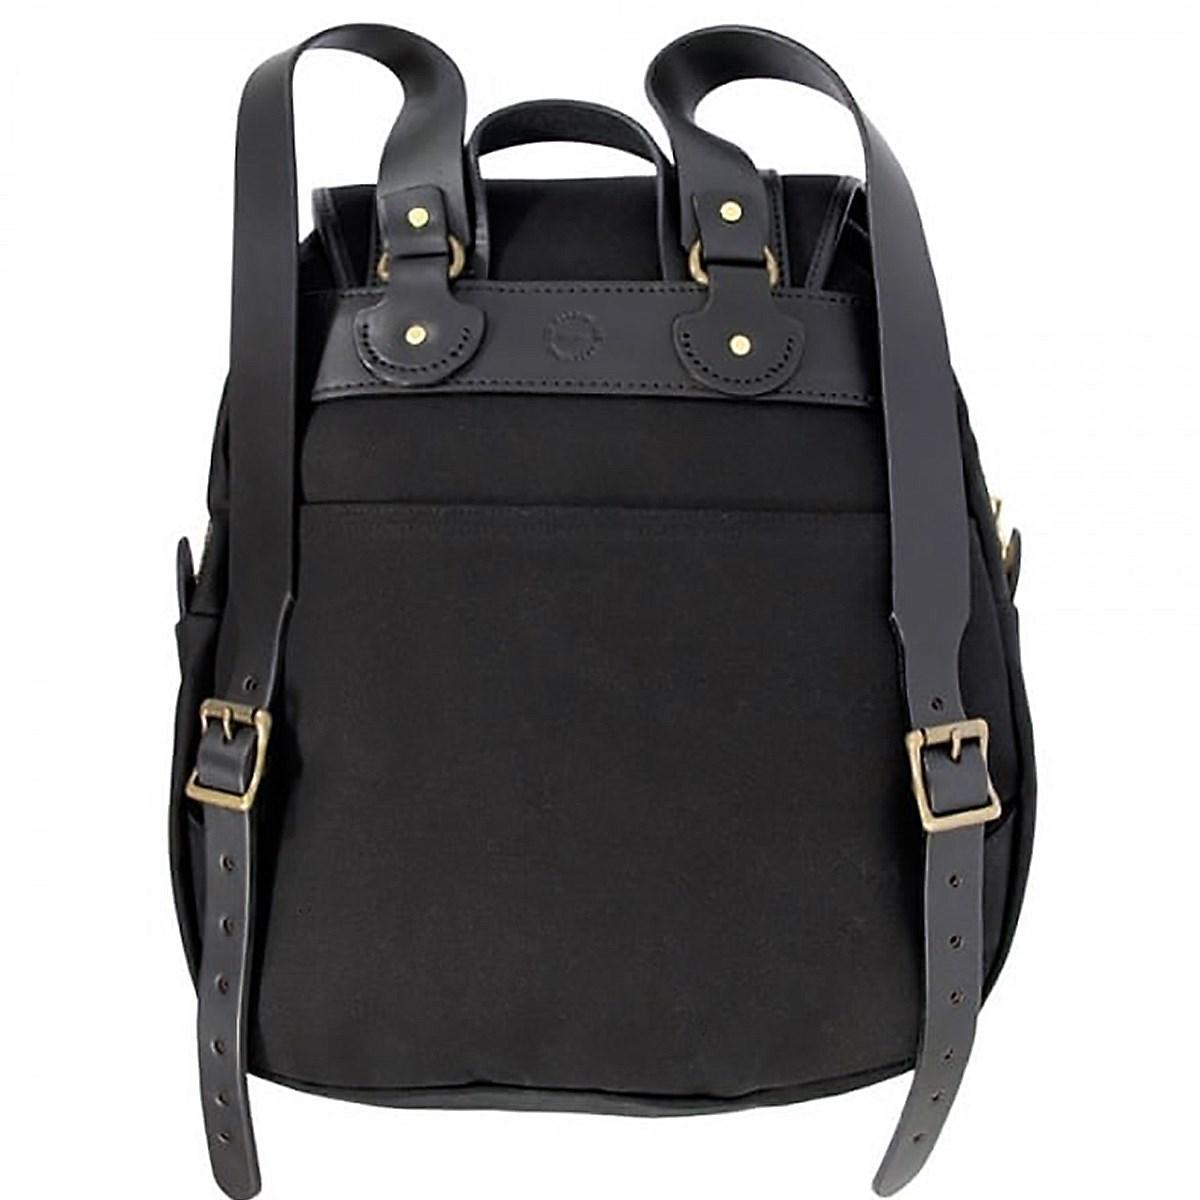 Filson 21L Rugged Twill Rucksack Backpack - Save 28% 2dbc06c27e